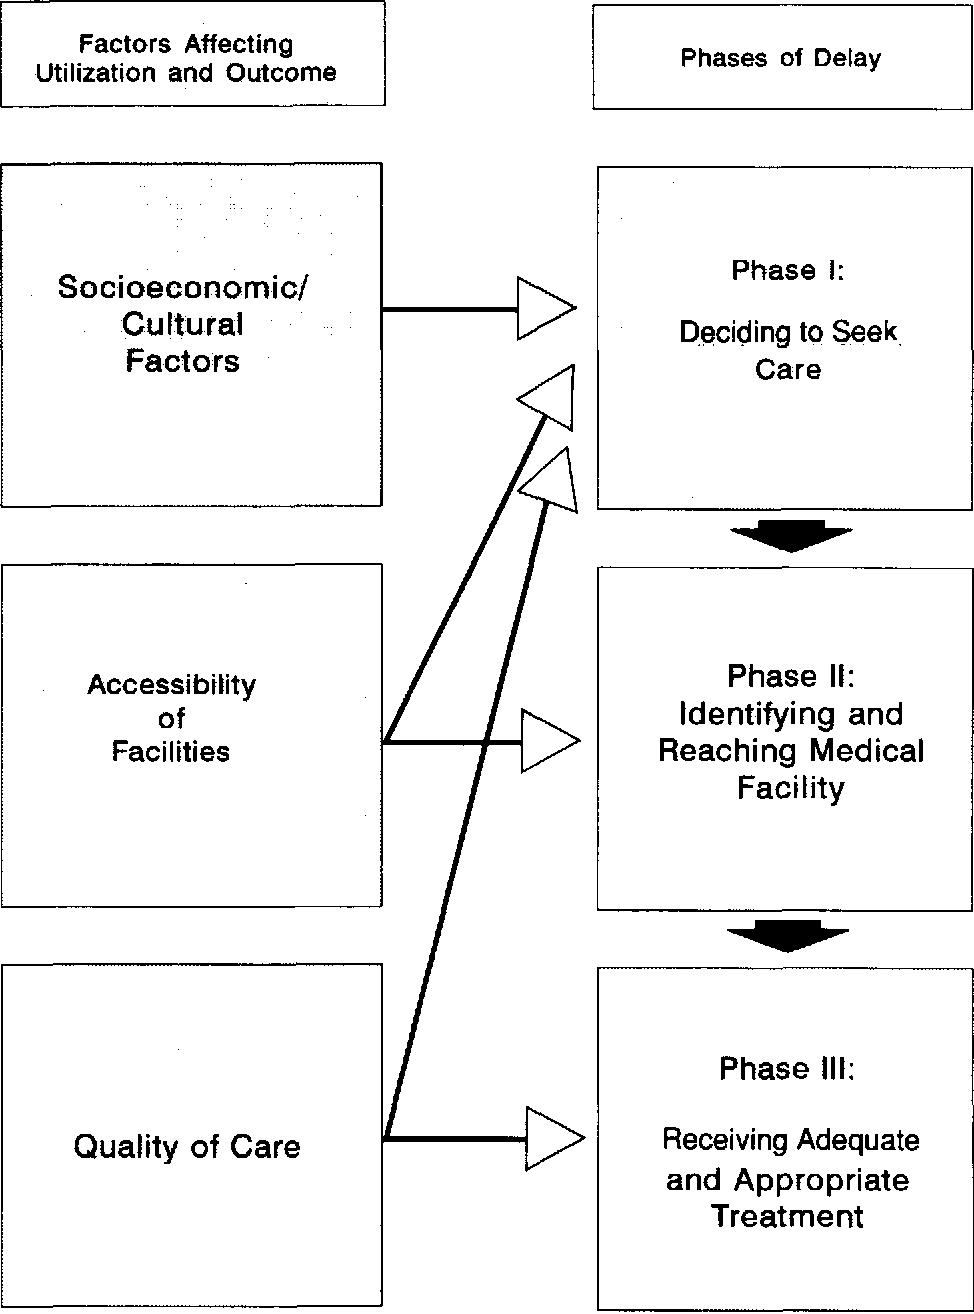 Too far to walk: maternal mortality in context  - Semantic